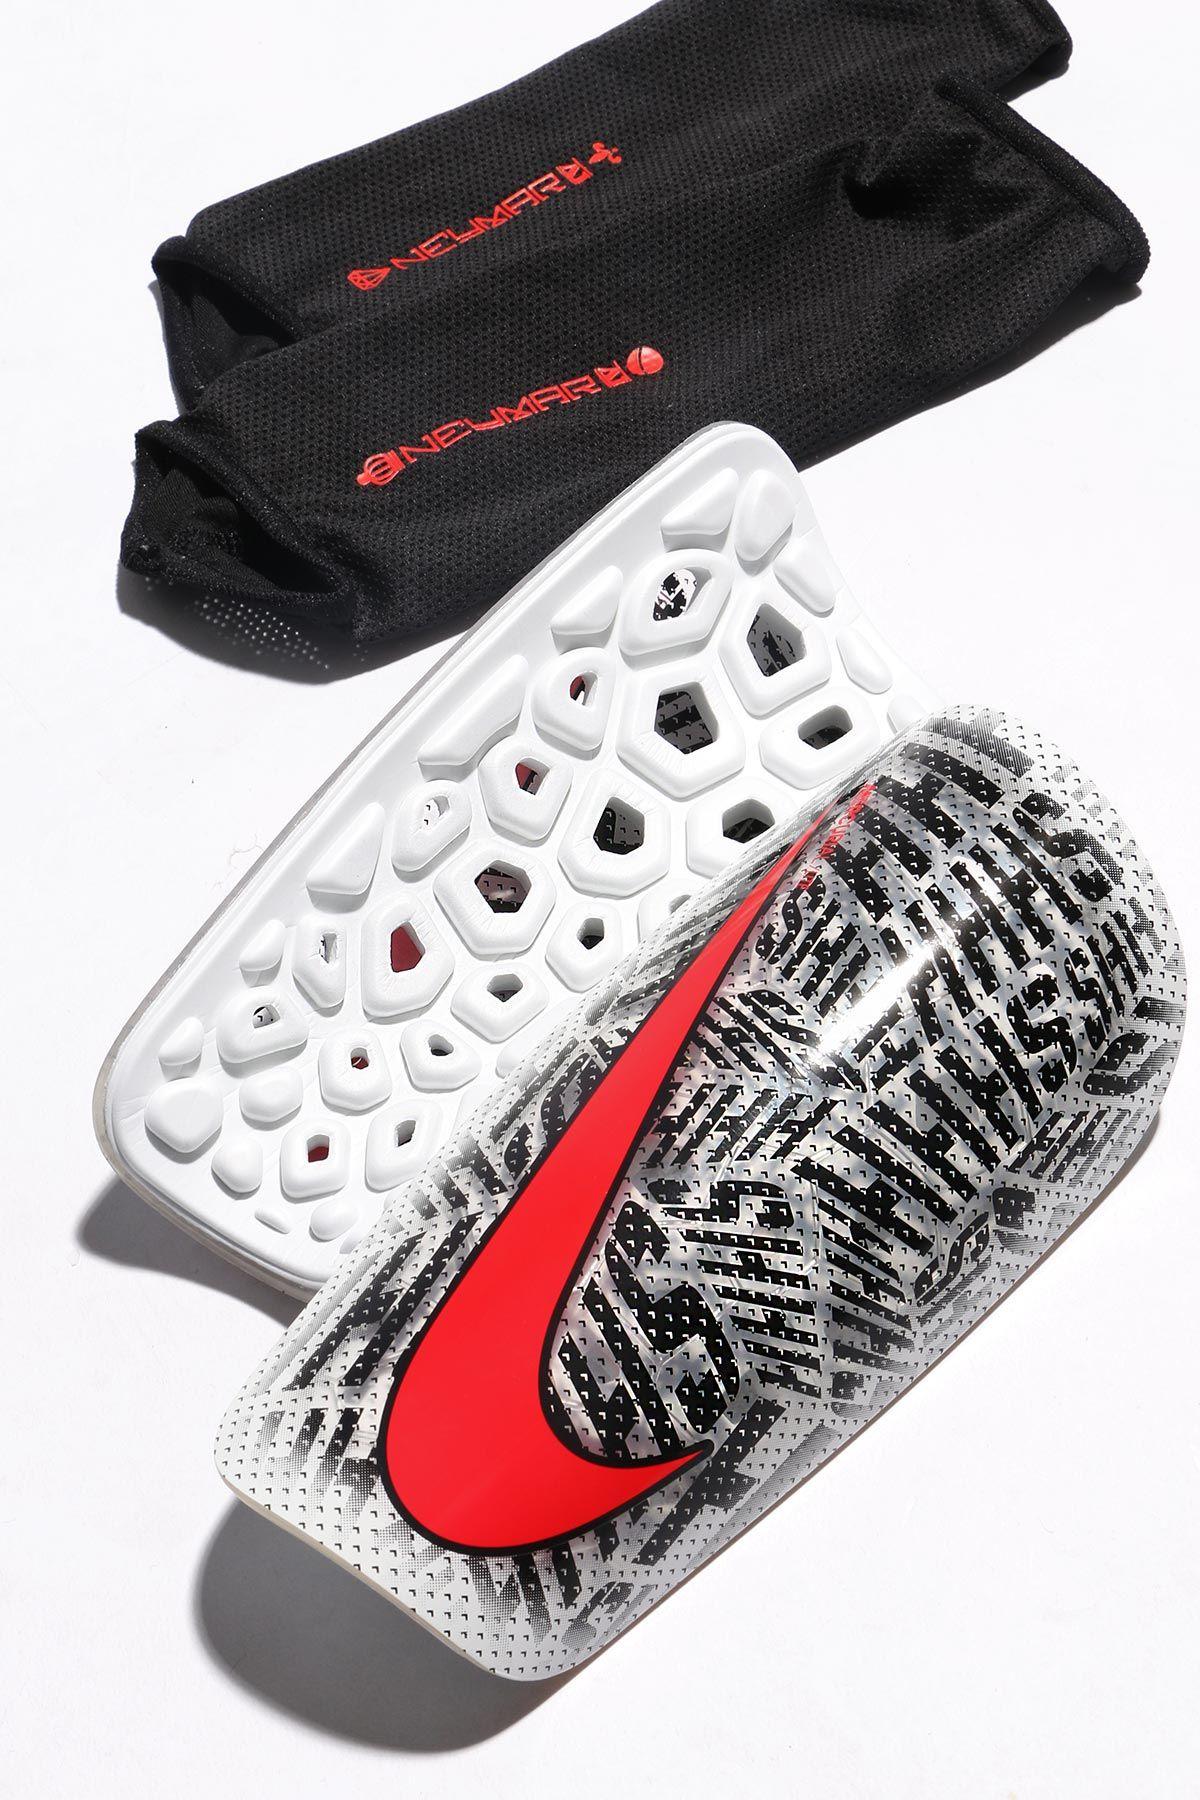 candidato Incidente, evento Residente  Espinilleras Neymar JR   Zapatos de fútbol nike, Taquetes de futbol, Nike  fútbol